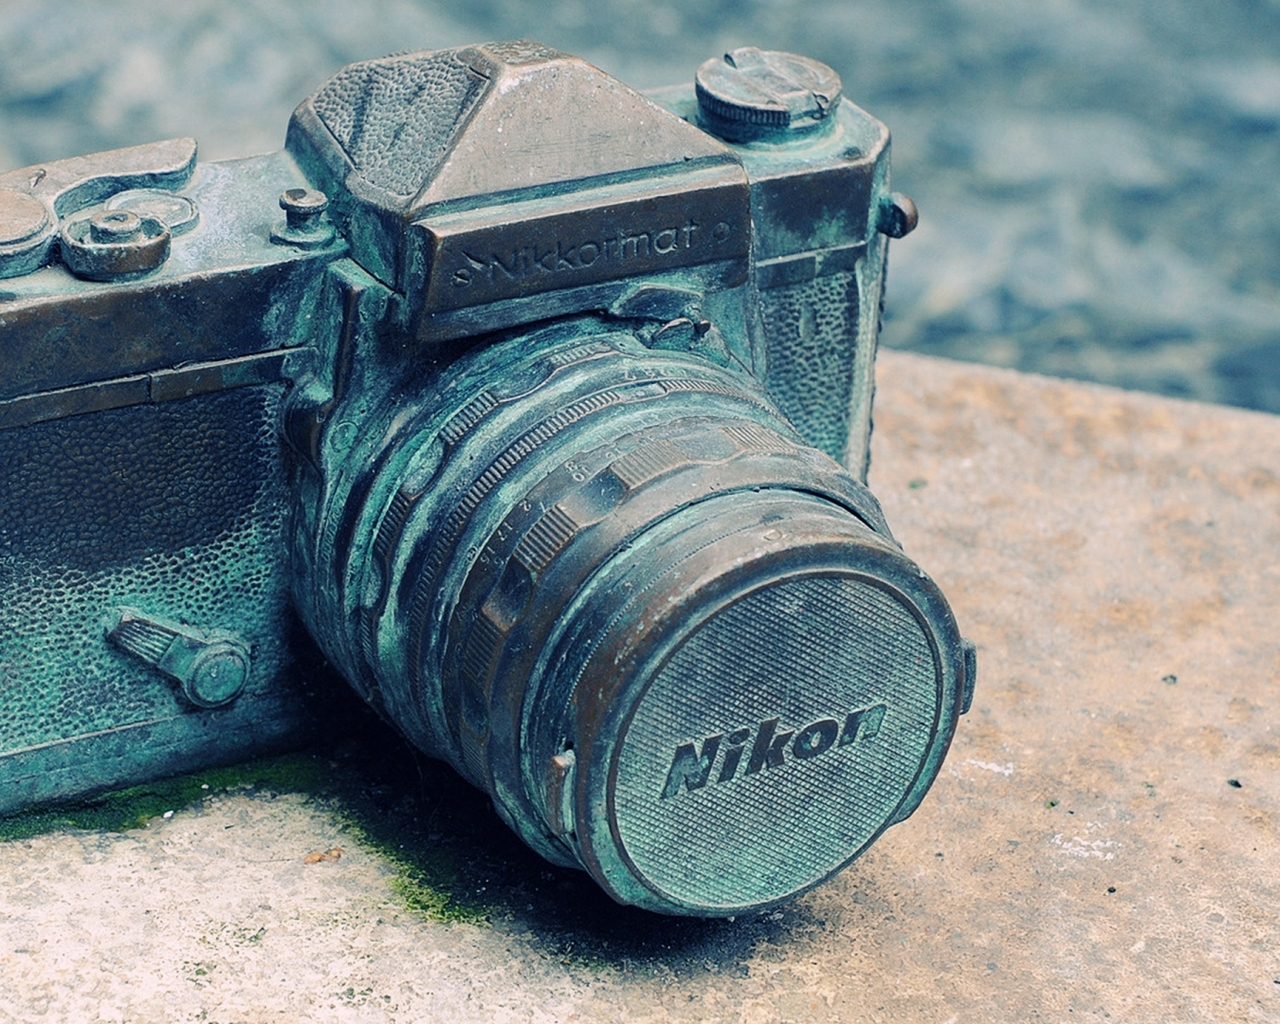 nikon-camera-vintage.jpg